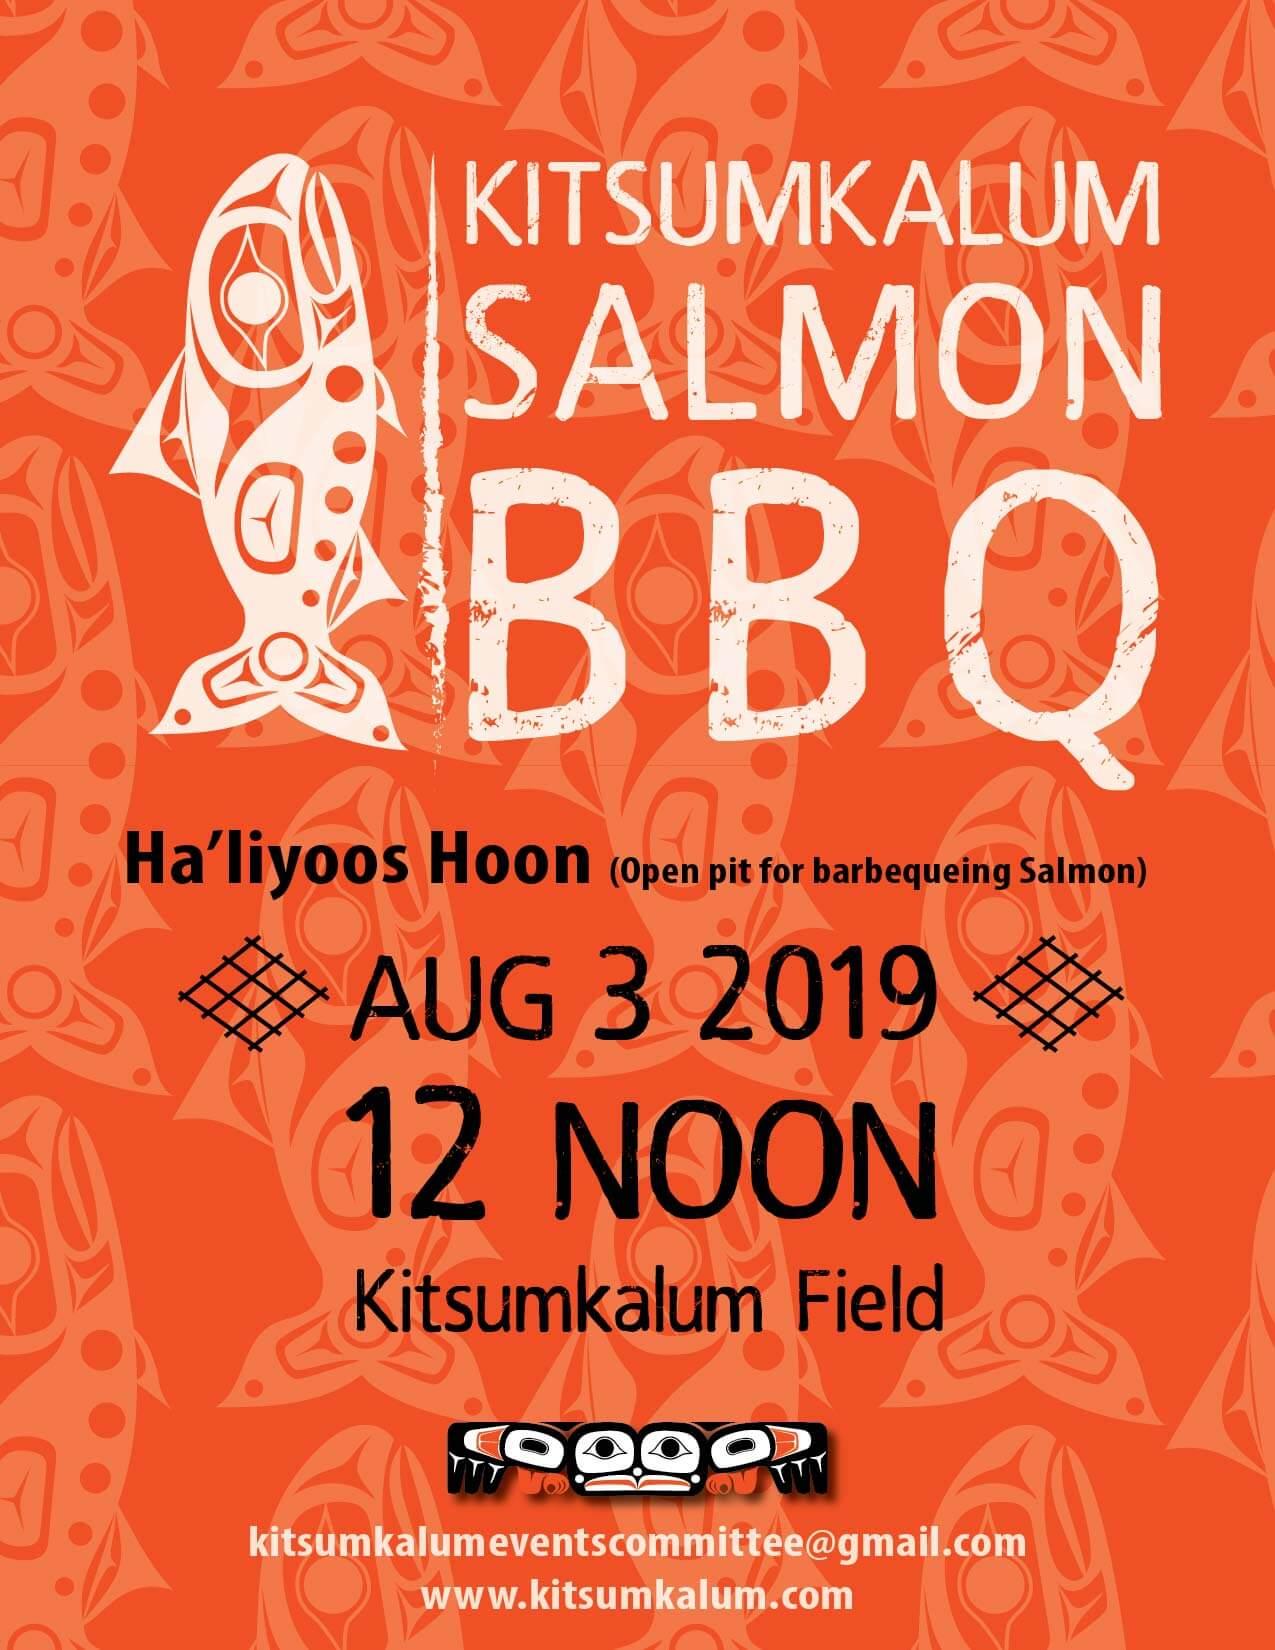 Kitsumkalum Salmon BBQ AUG 3